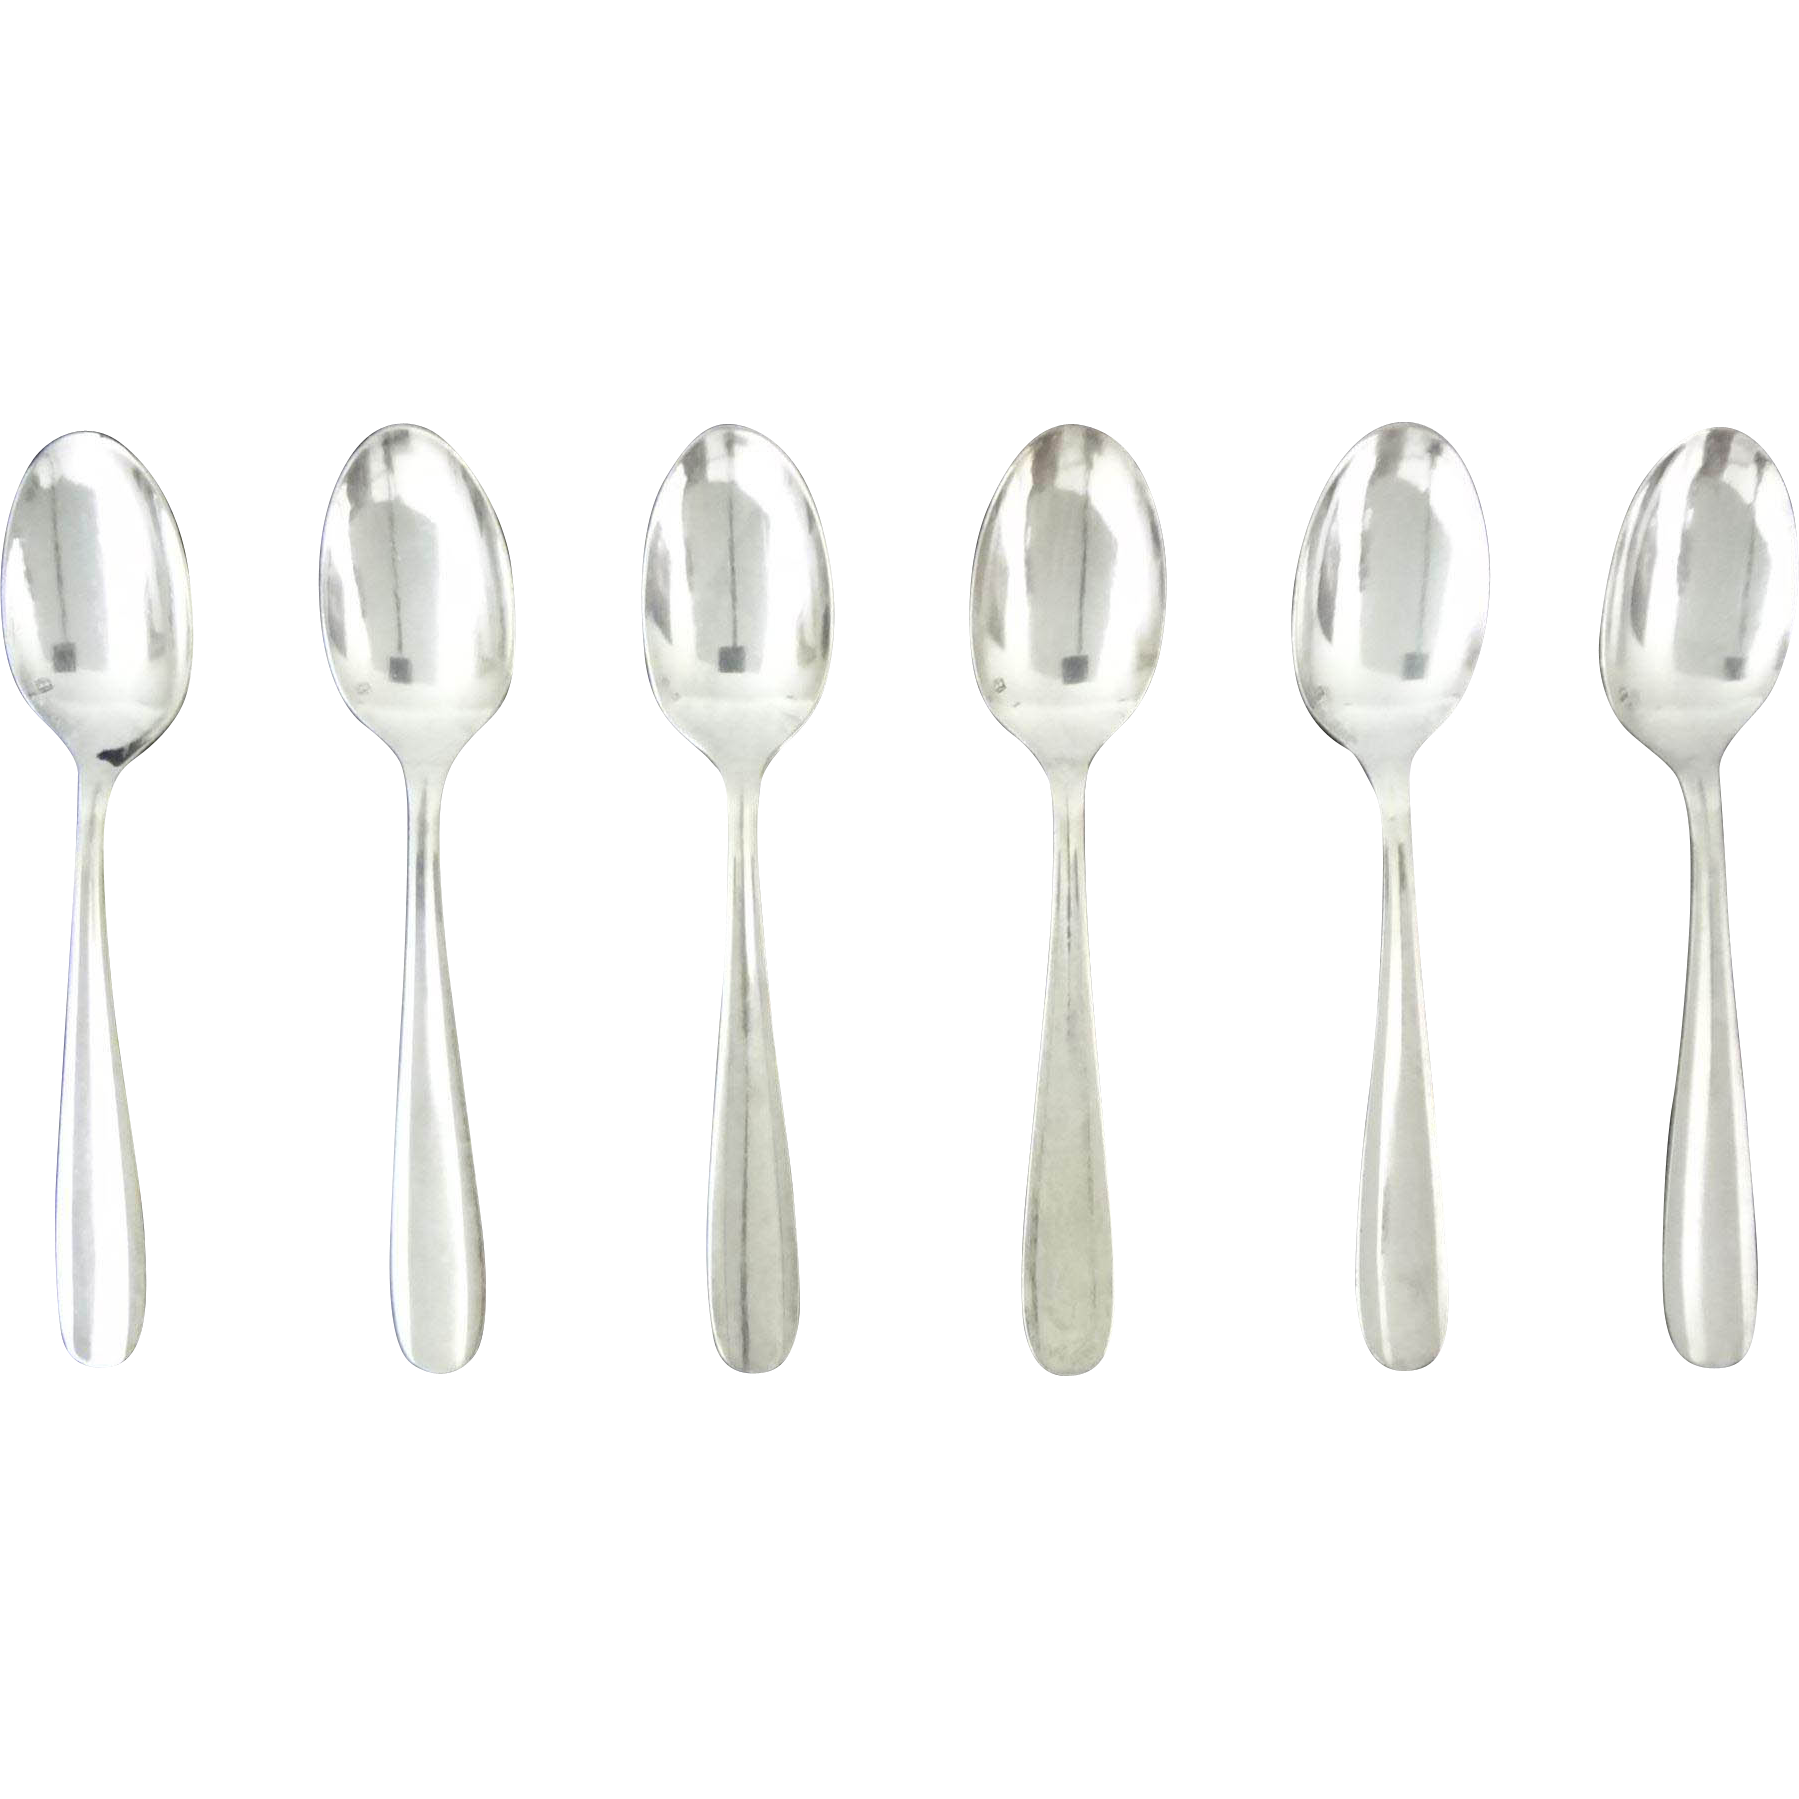 Set 6 Christofle Silver Plate Demi Tasse Spoons Modern Pattern - 20th Century, France